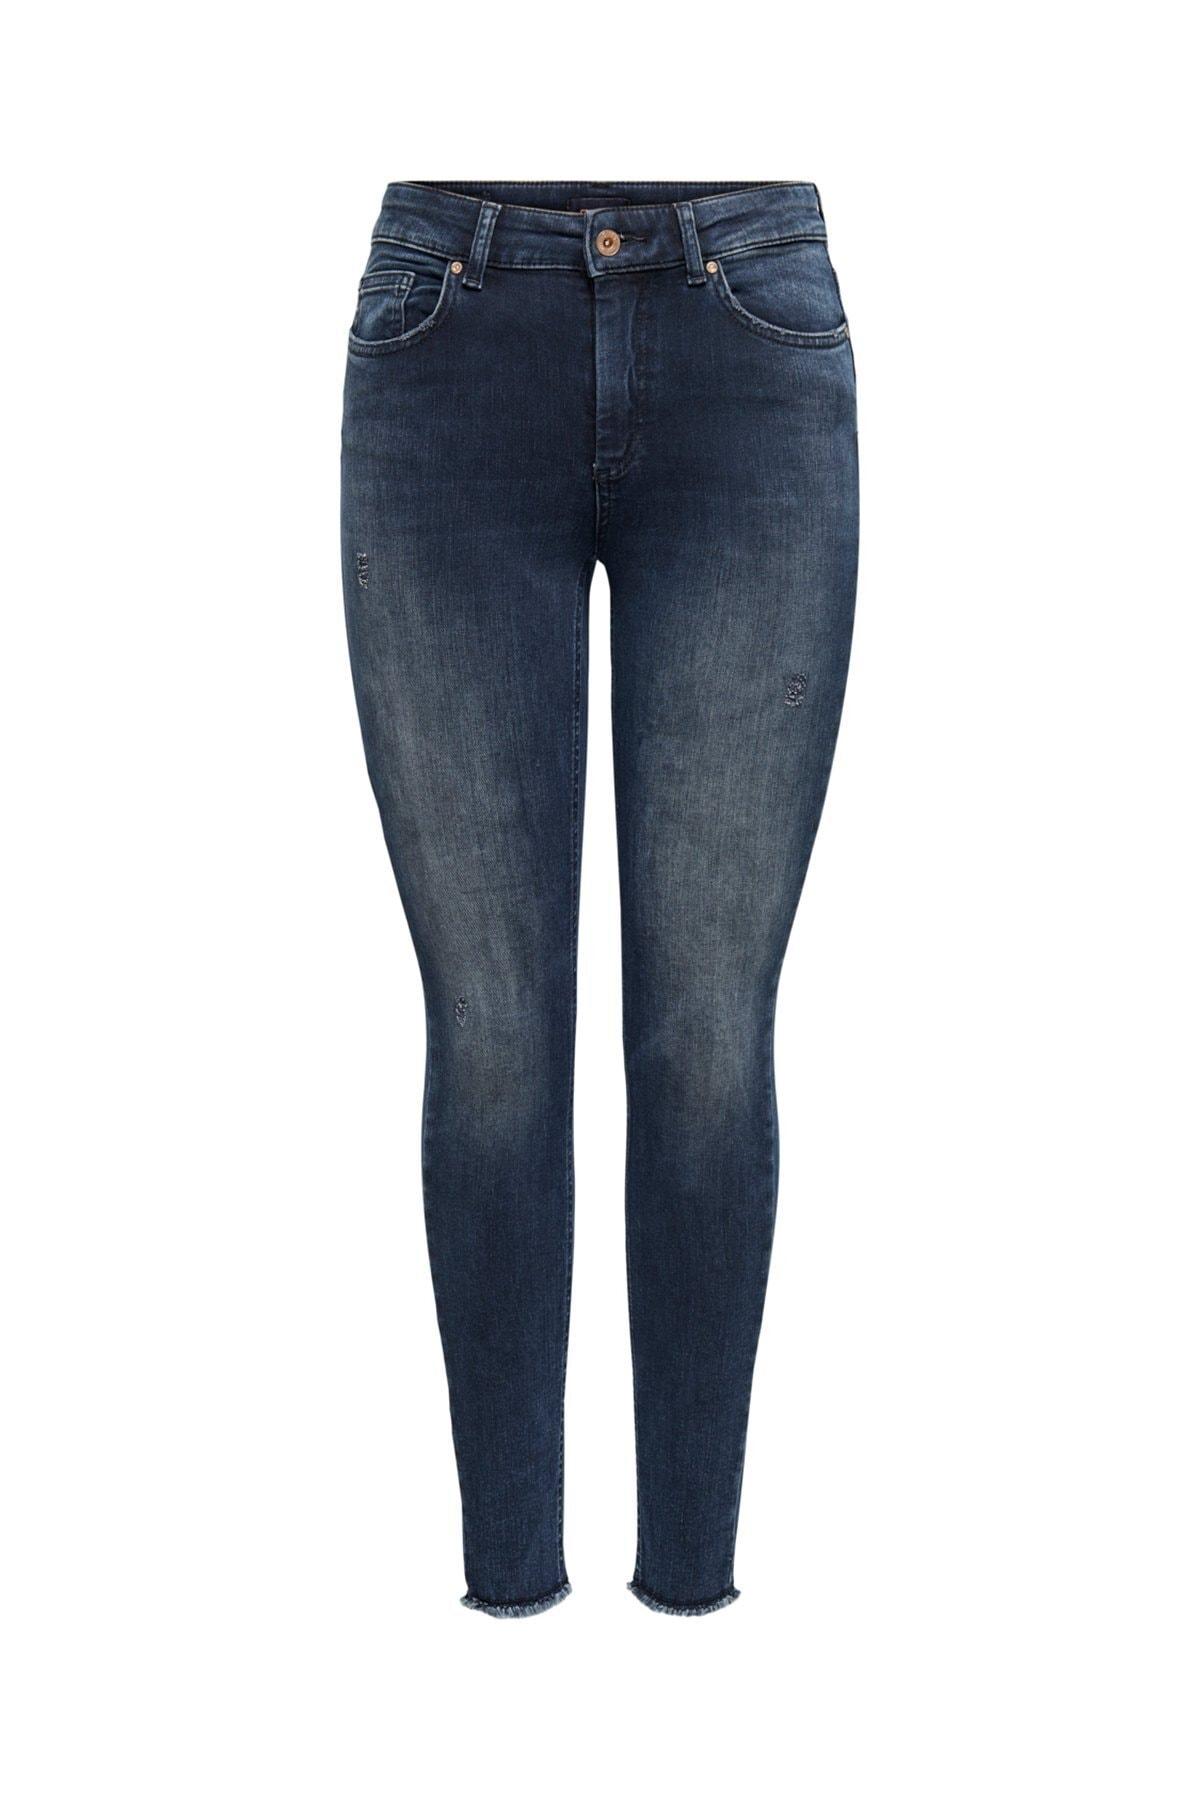 Only Onlblush Rea 409 Jeans 15209618 1